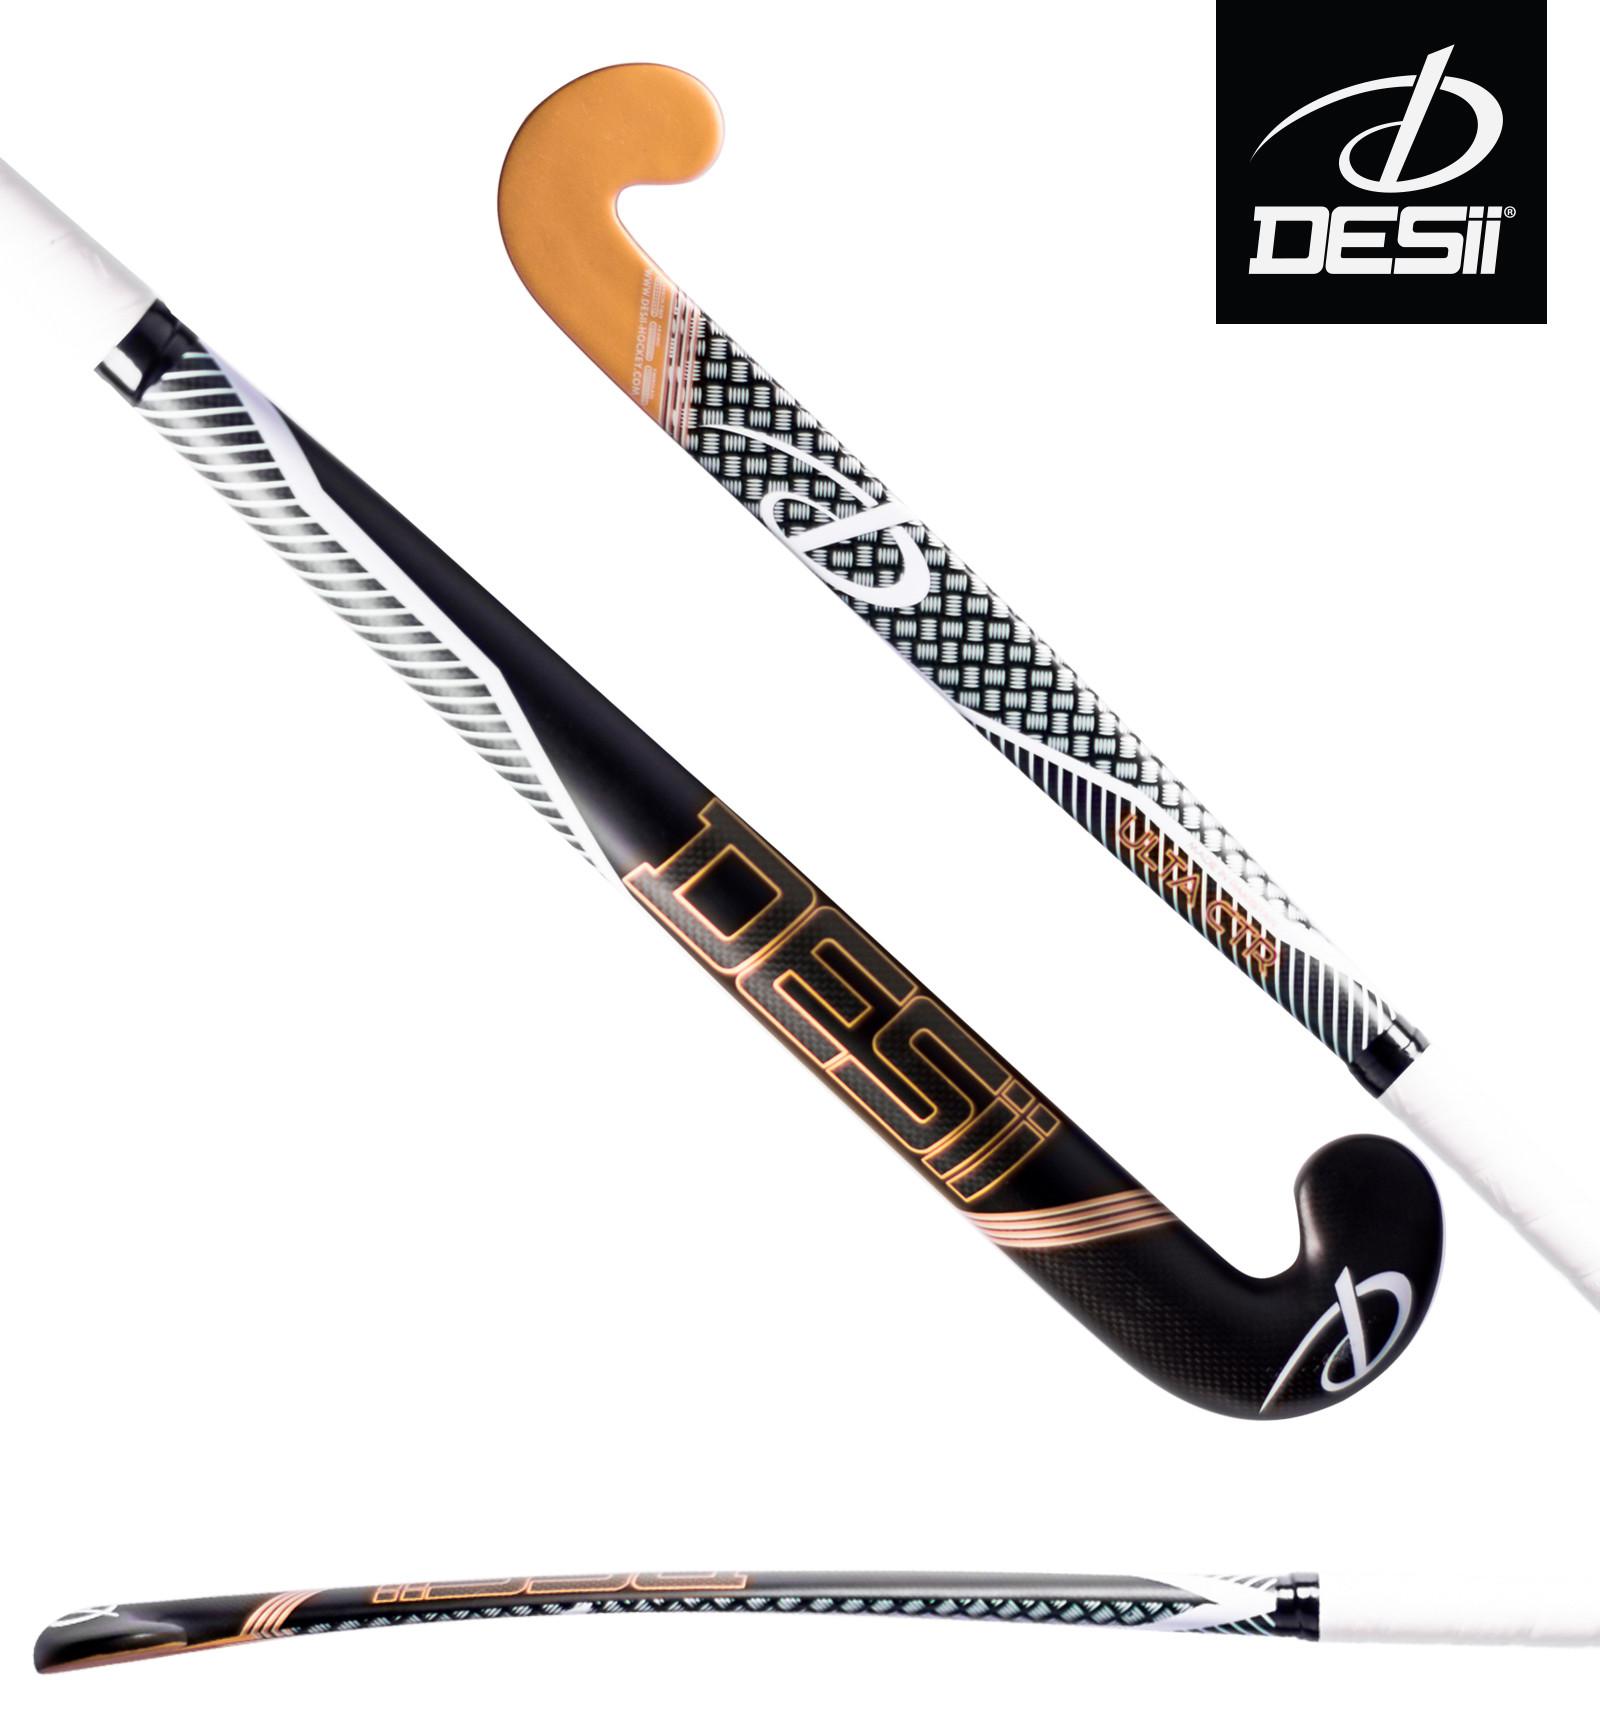 Hockeyschläger - Desii -  kopen - Desii Ultra Control 2017-2018